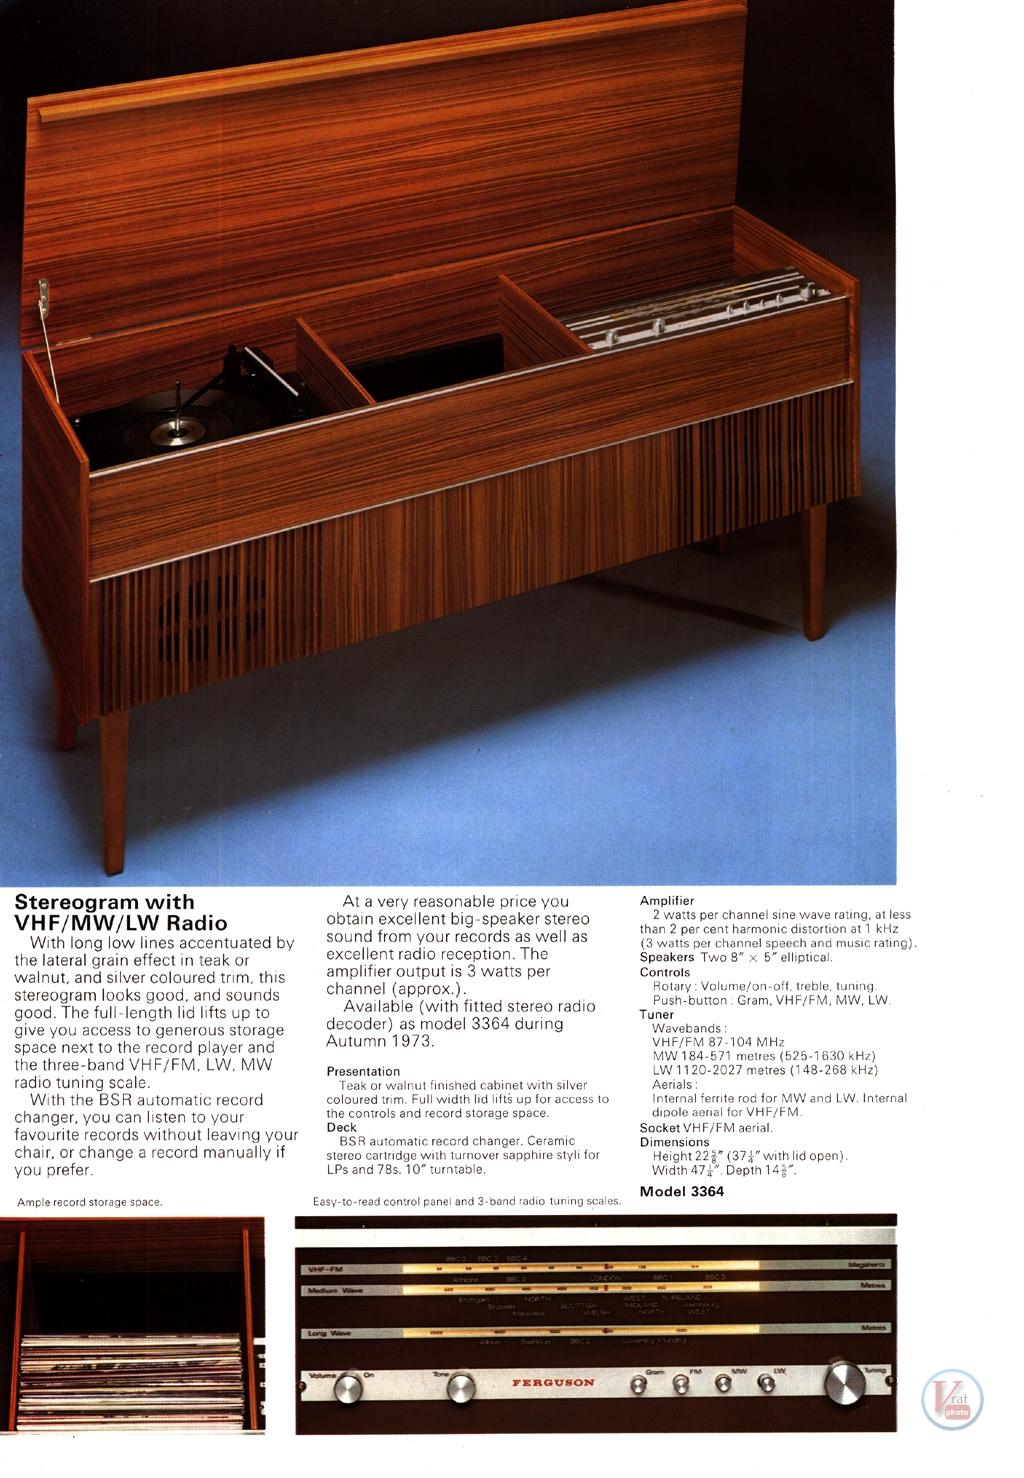 1973 Ferguson Brochure 128